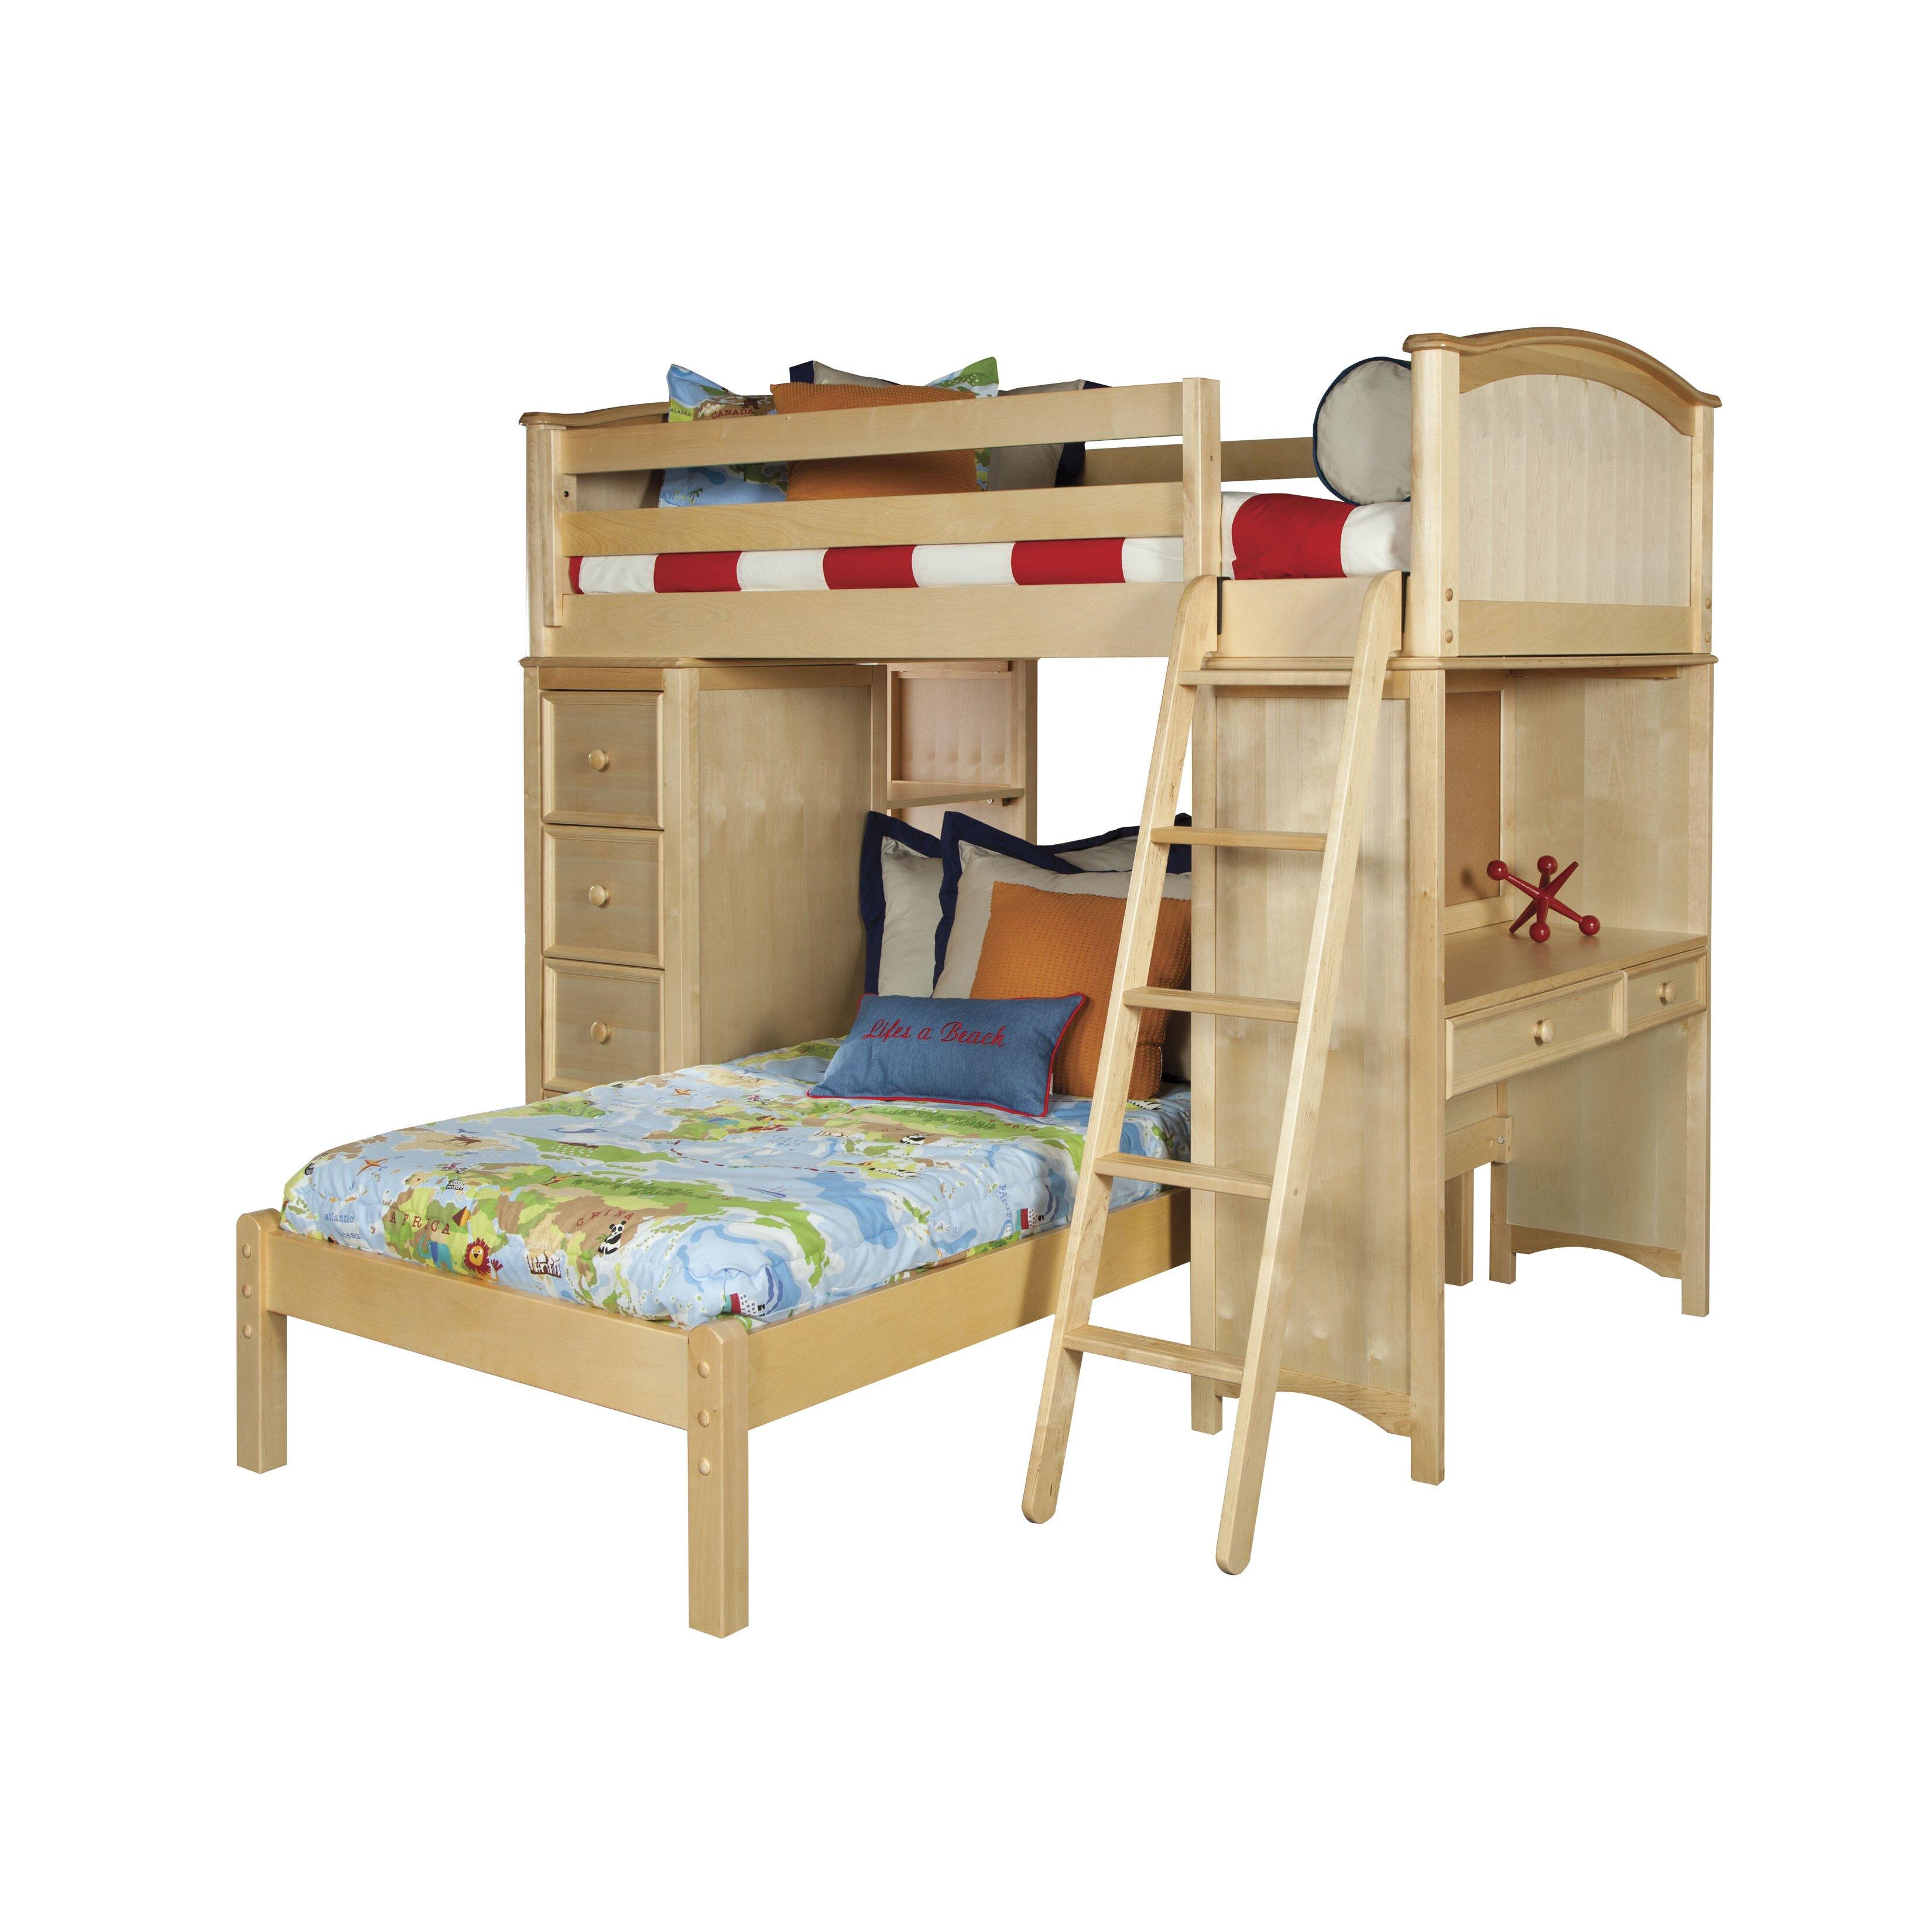 viv rae david twin loft bed customizable bedroom set